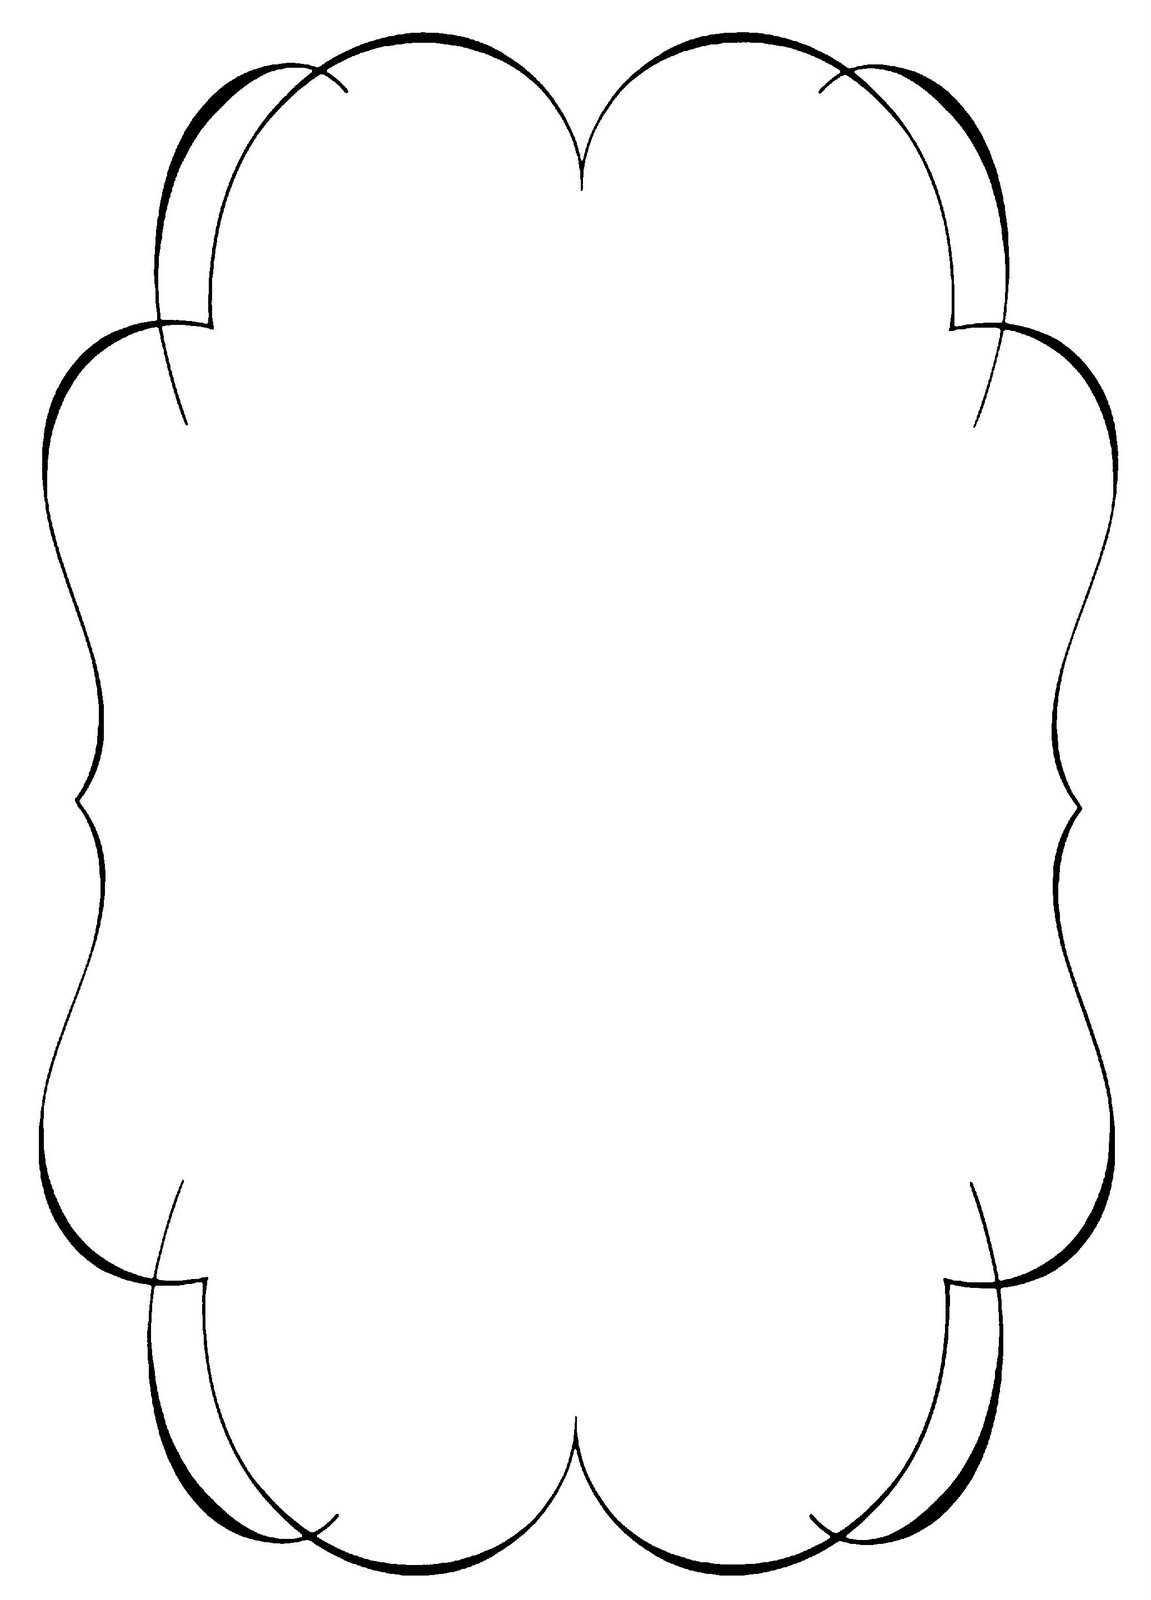 Line clipart elegant Elegant Clip Free Art